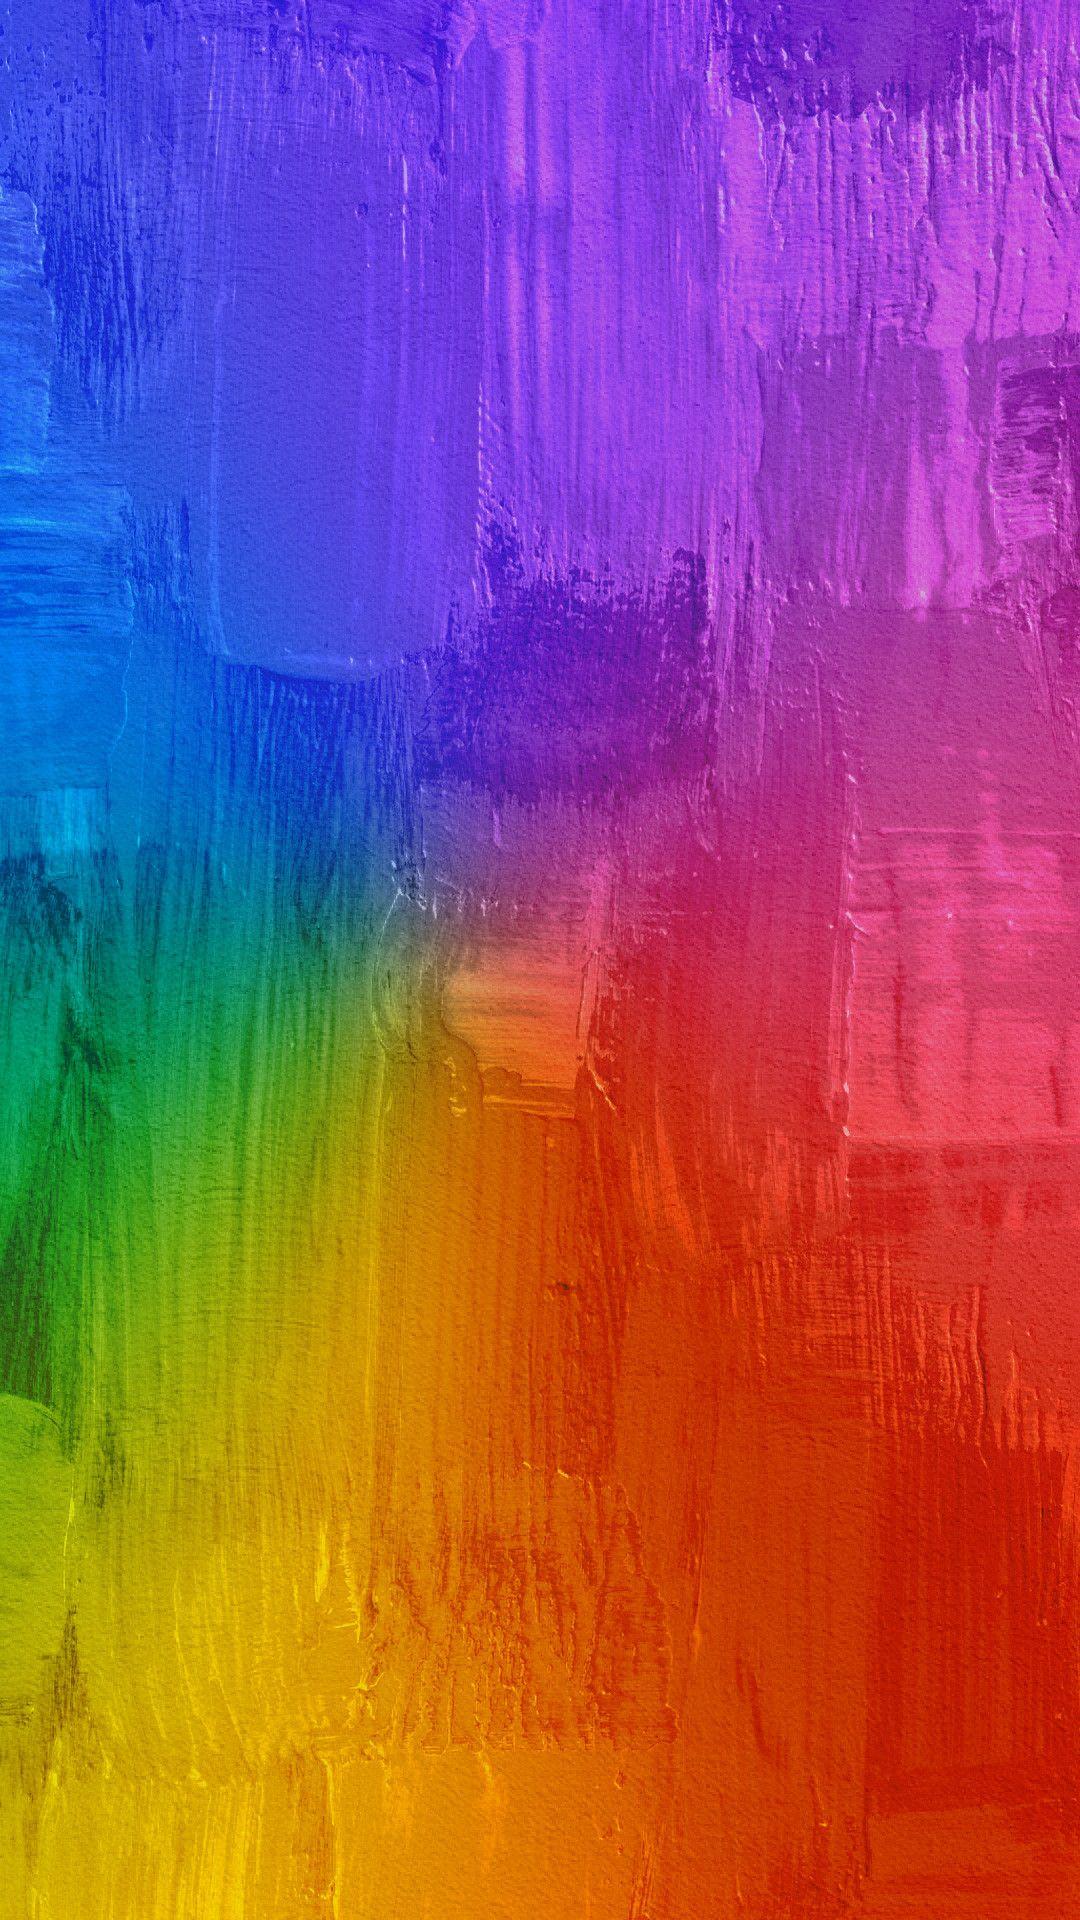 Fondo de colores arco iris | Rainbow wallpaper - #backgrounds ...